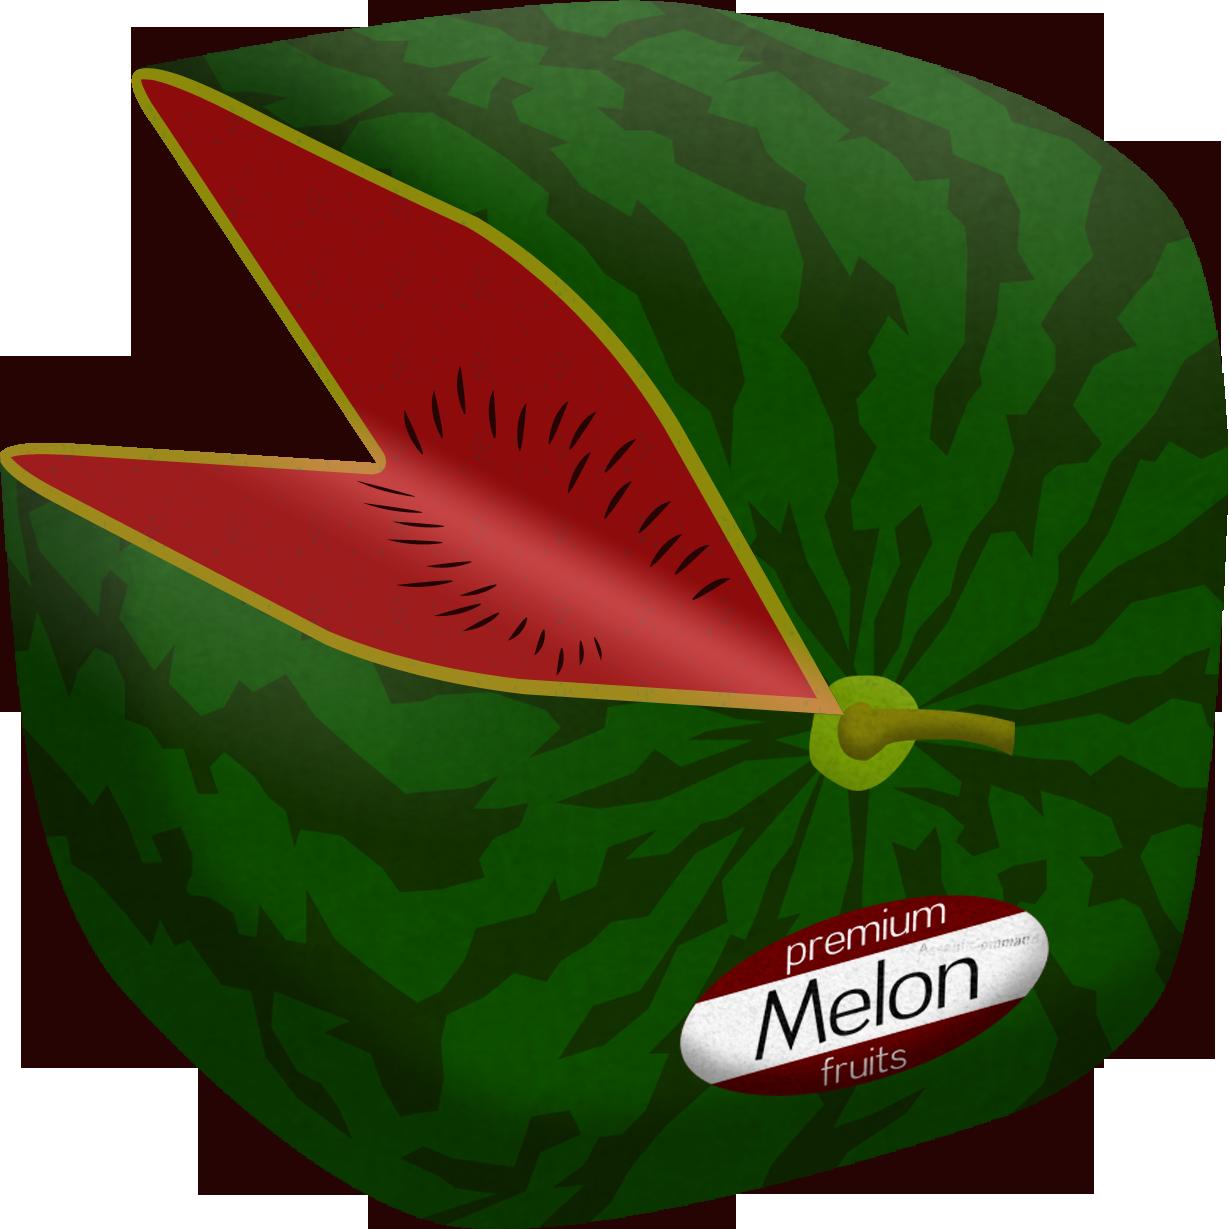 Cube Melon by Floodgrunt